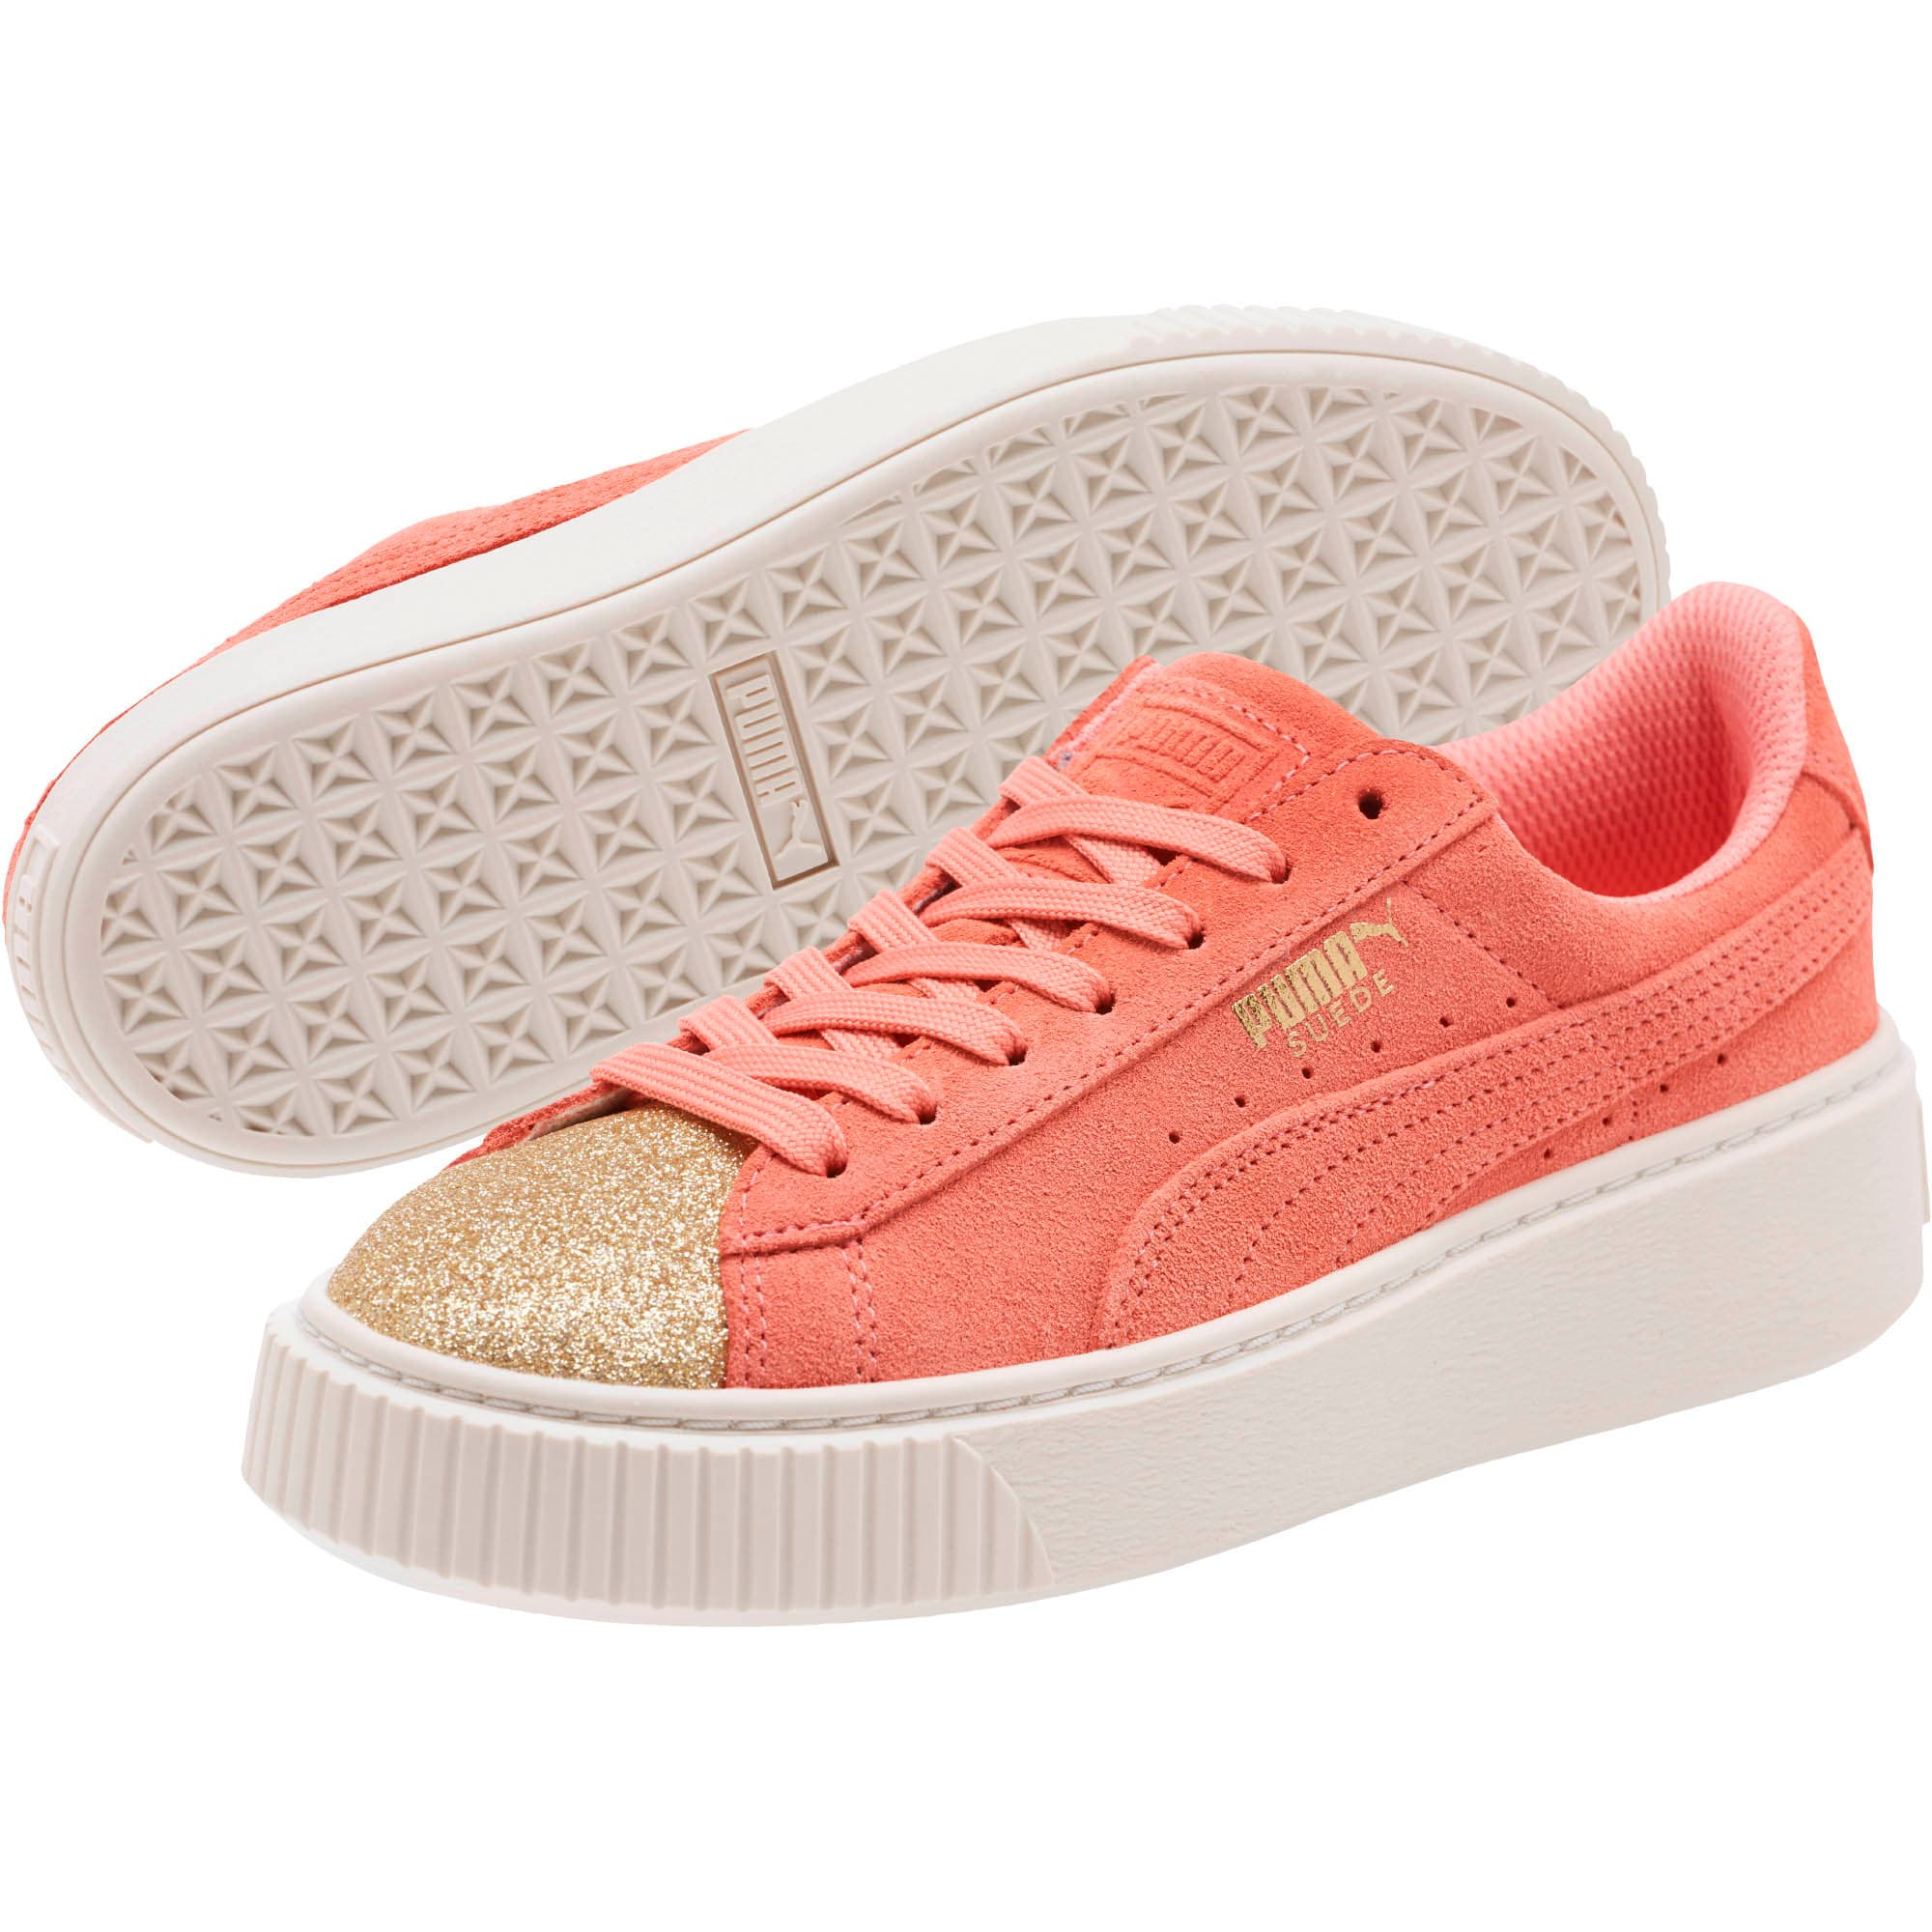 Thumbnail 2 of Suede Platform Glam Girls' Sneakers, Puma Team Gold-Shell Pink, medium